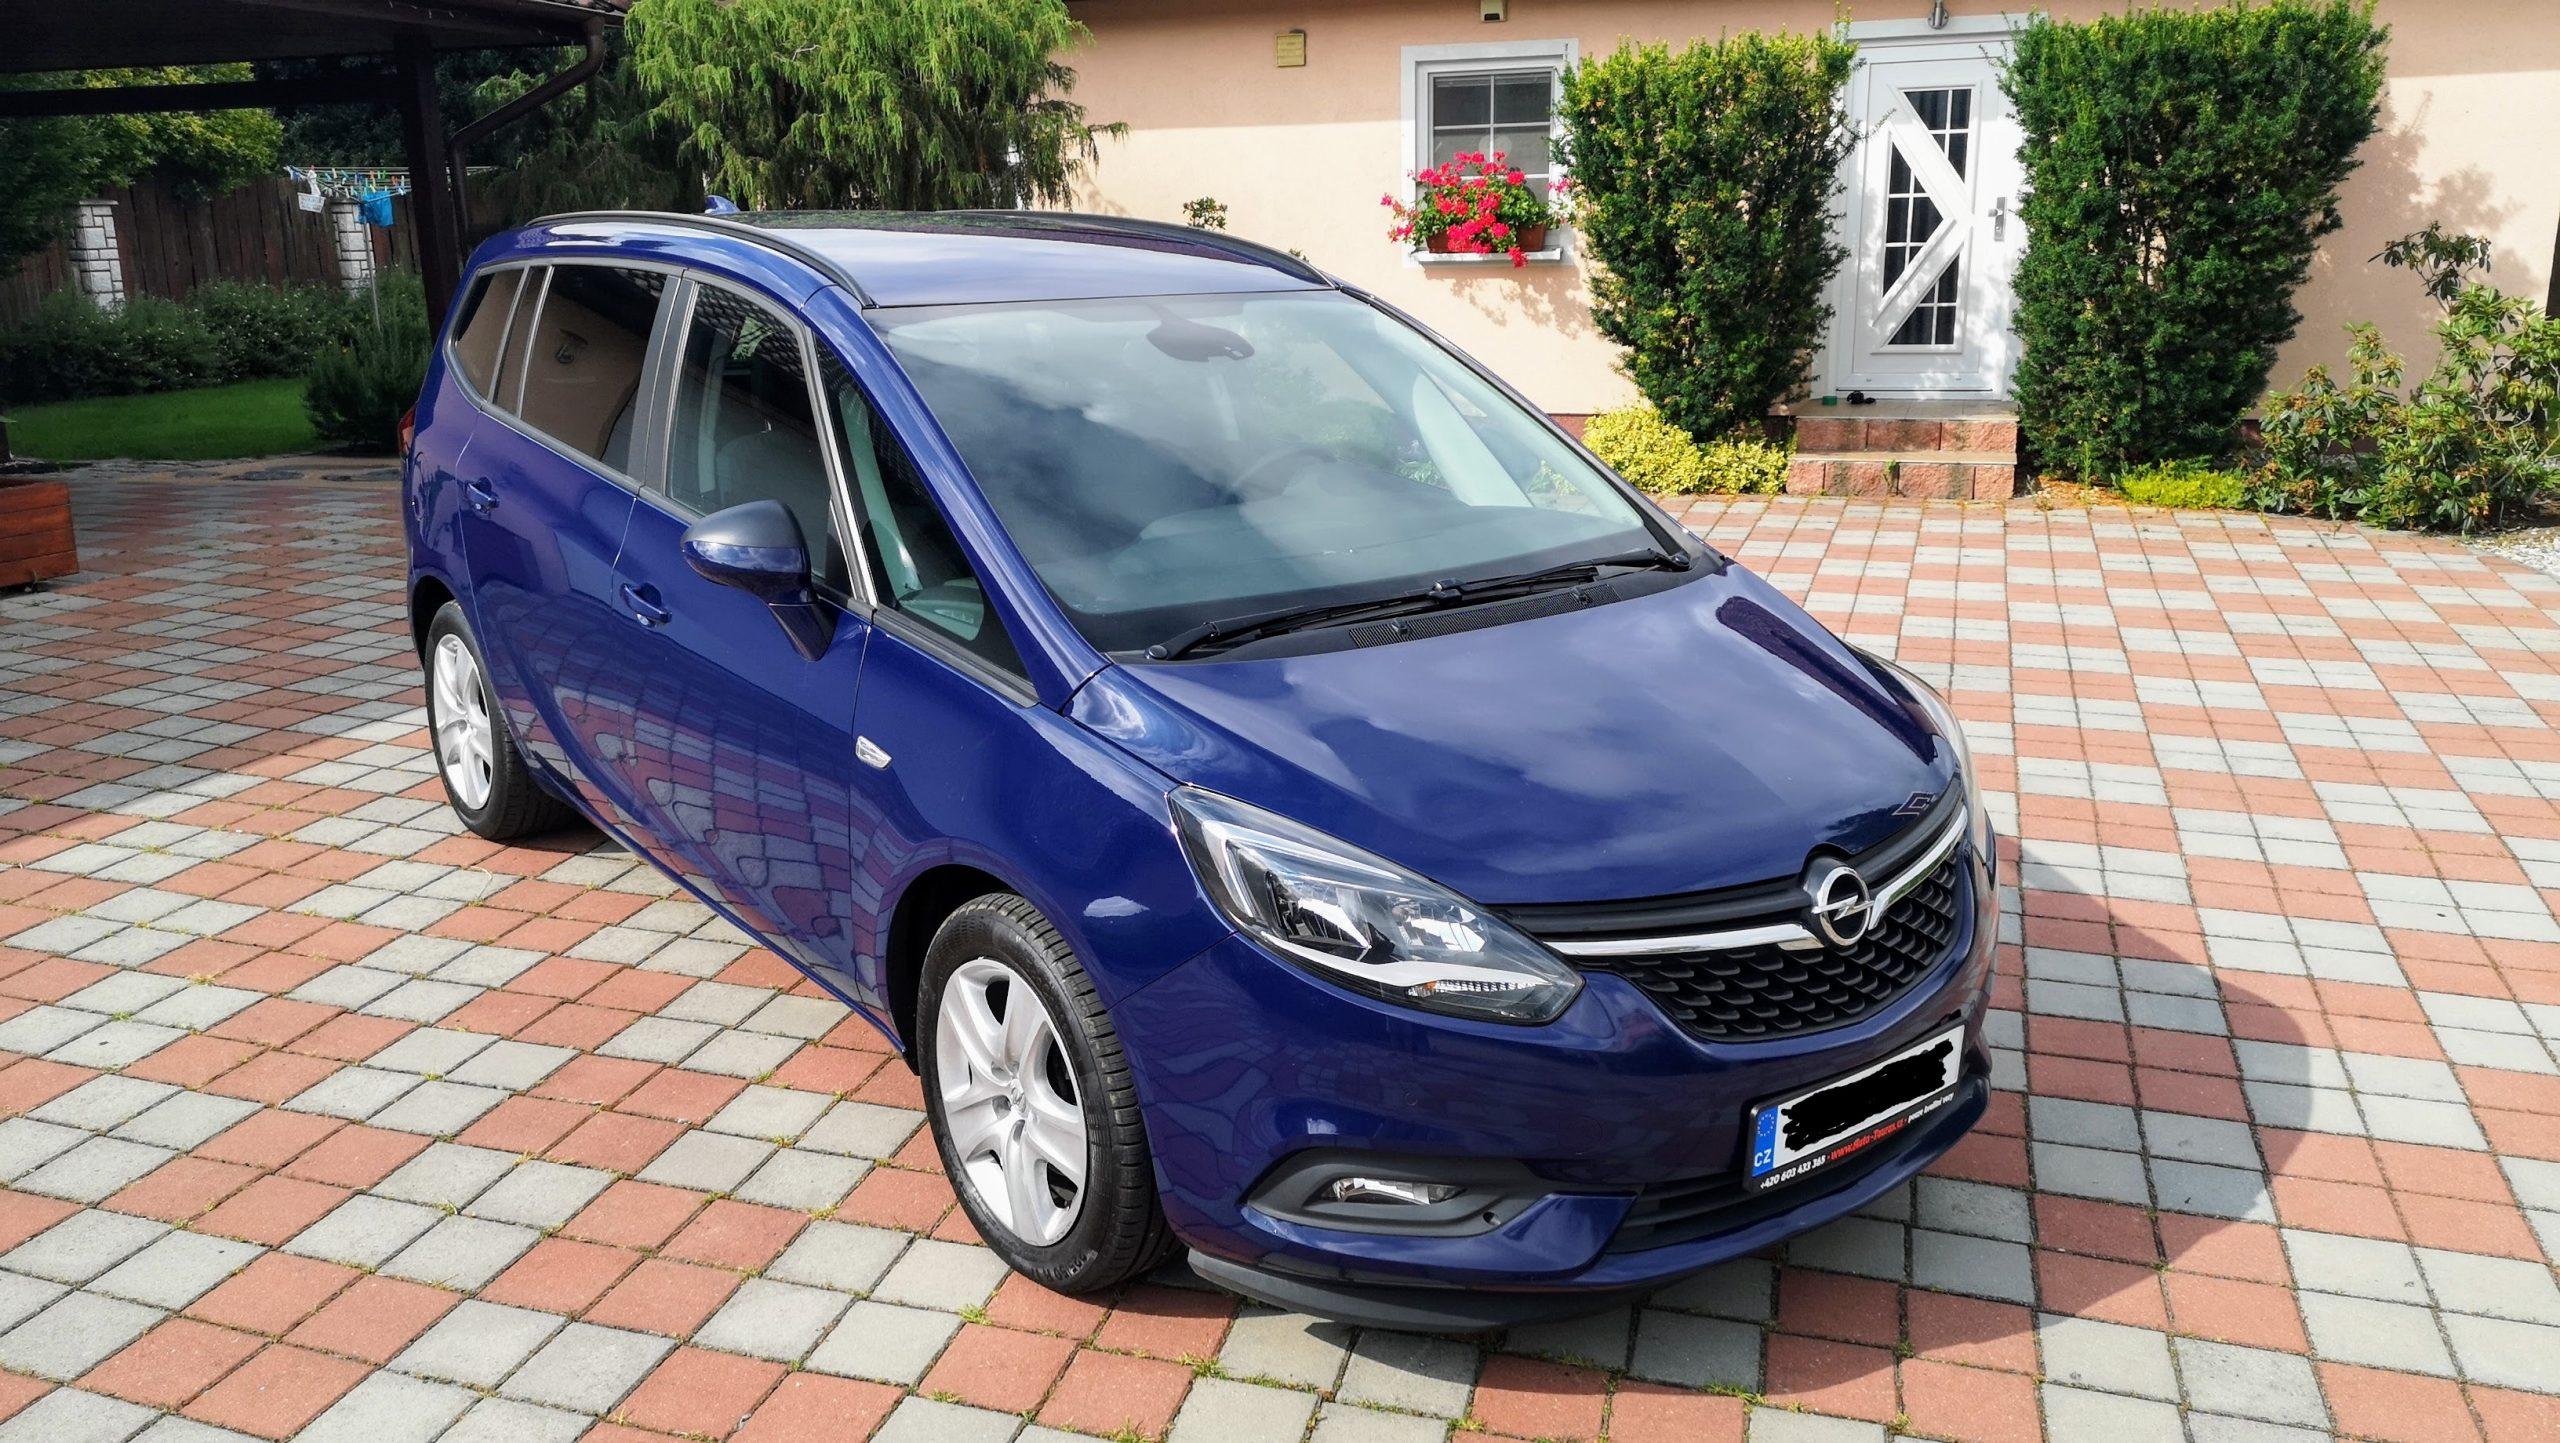 Dovoz aut,Opel Zafira Tourer